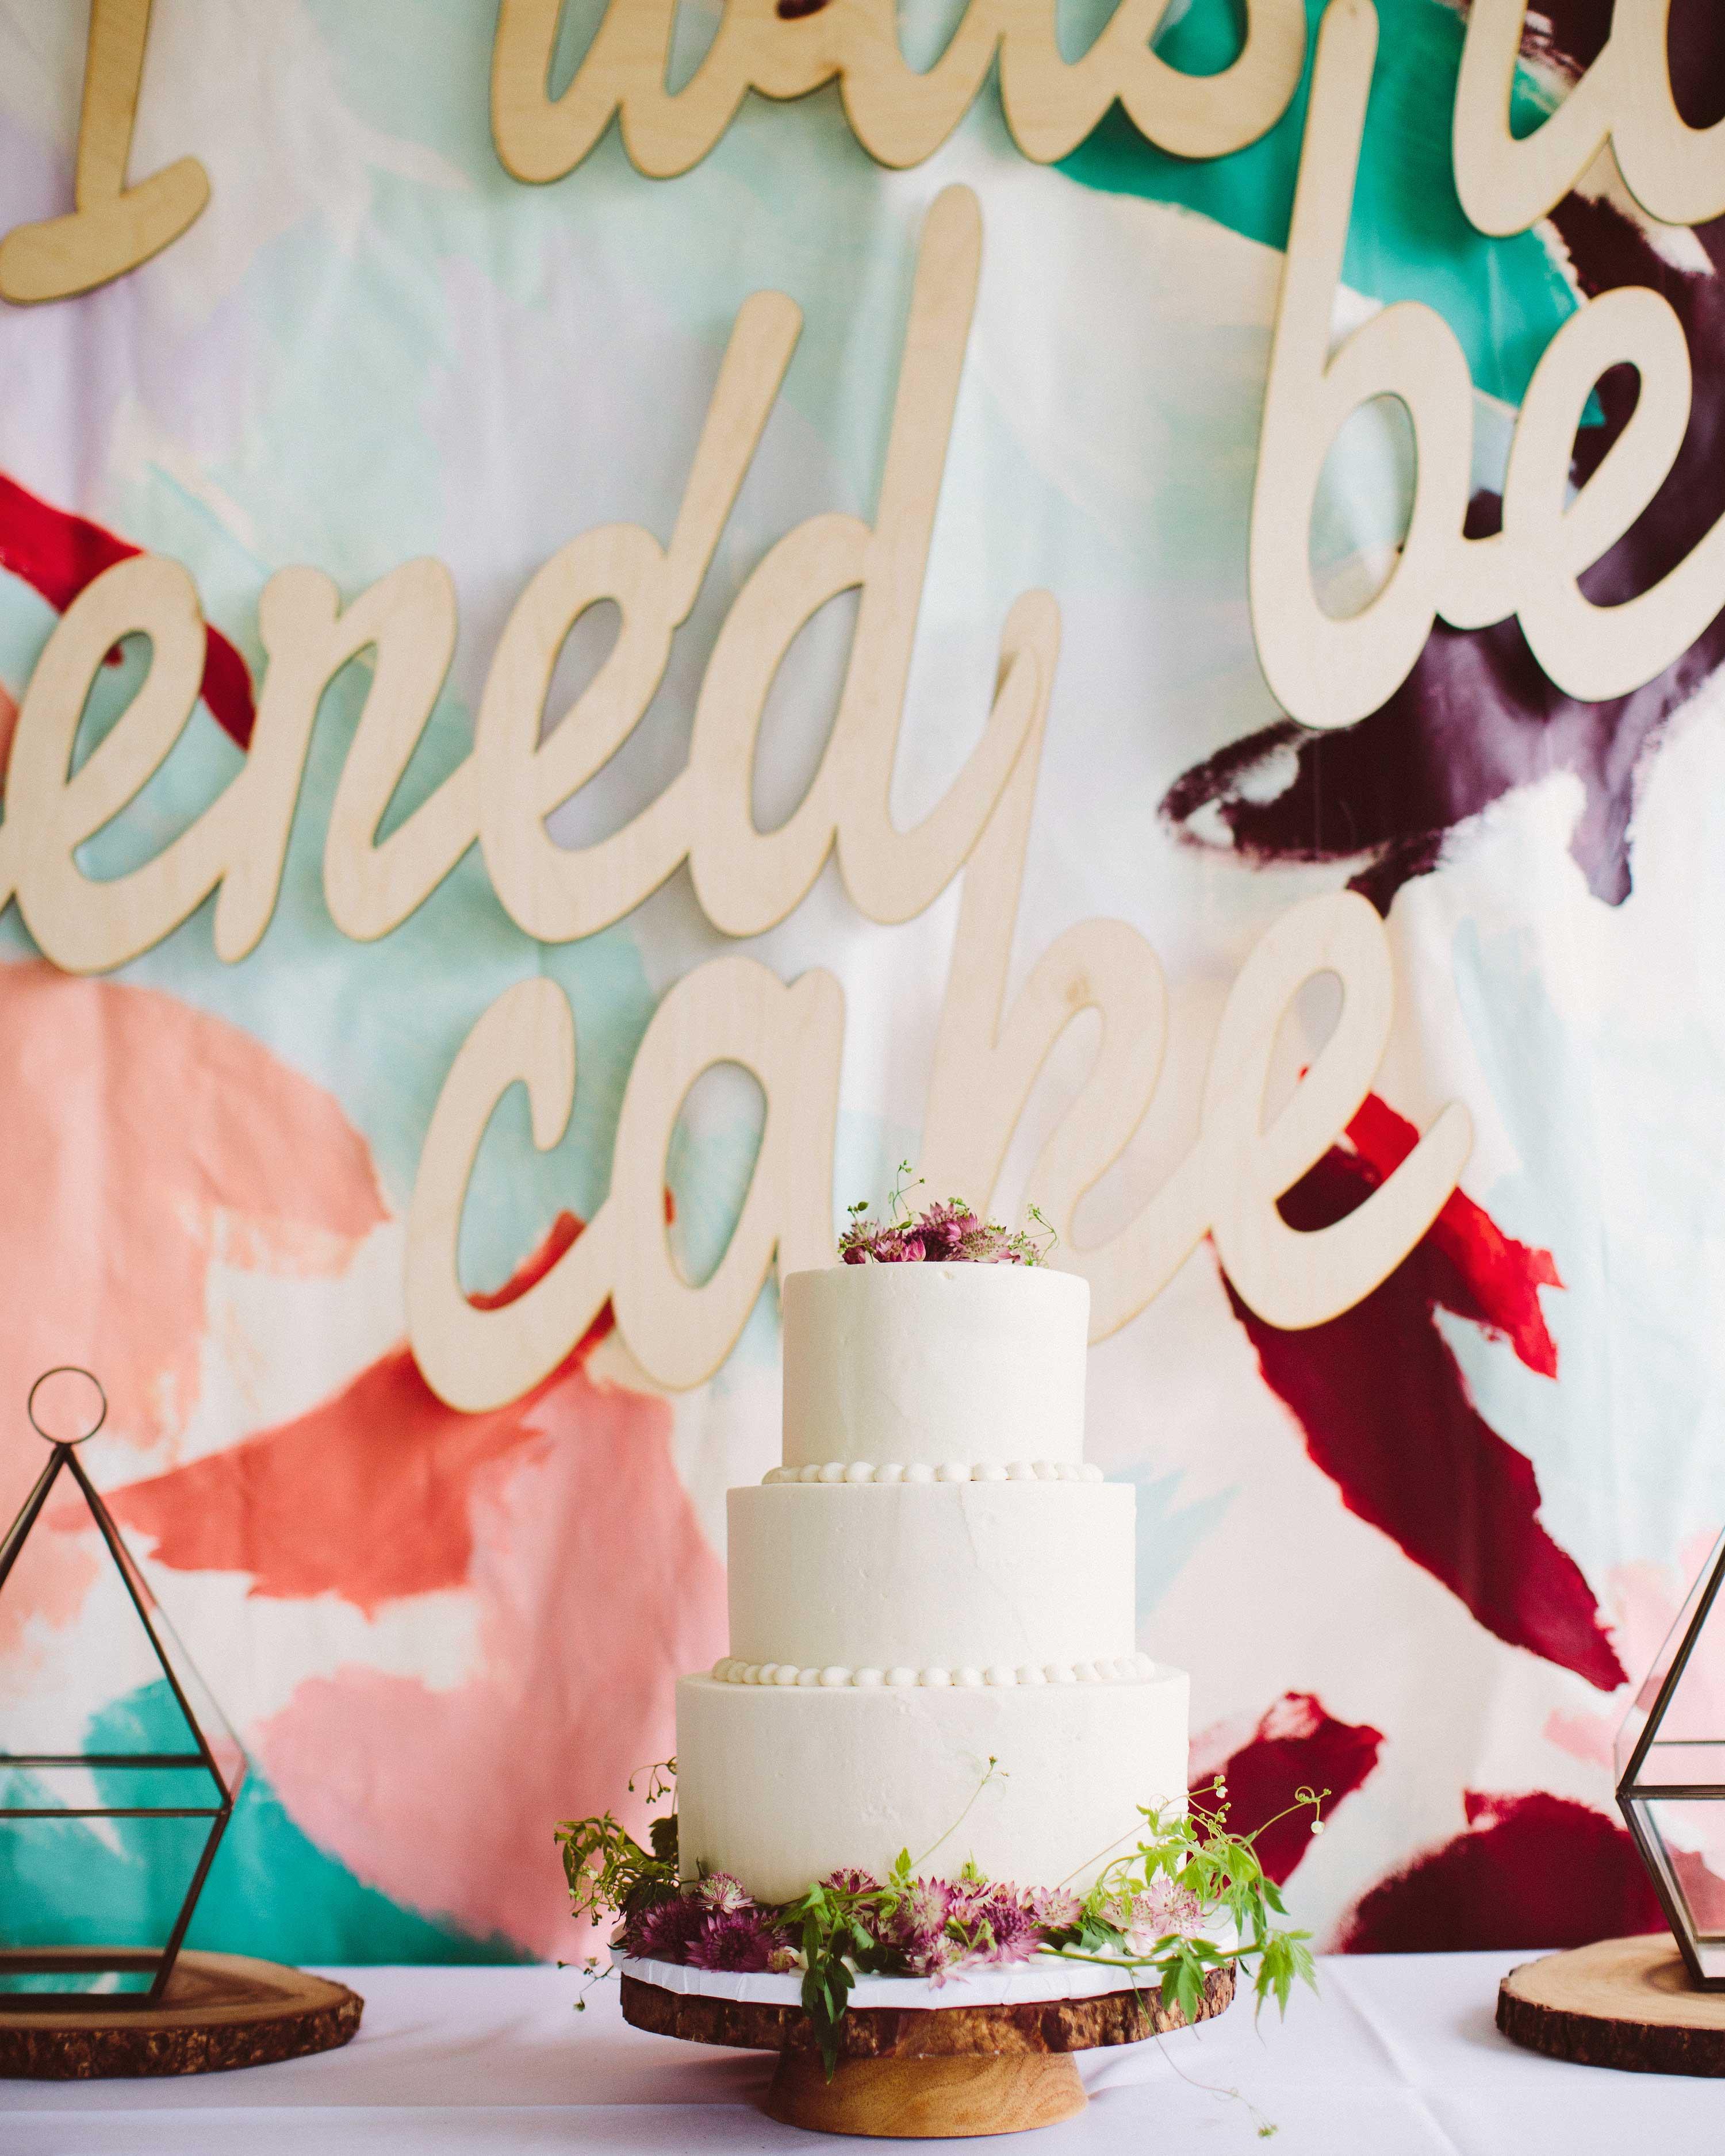 alisa-barrett-wedding-cake-1014-s113048-0716.jpg